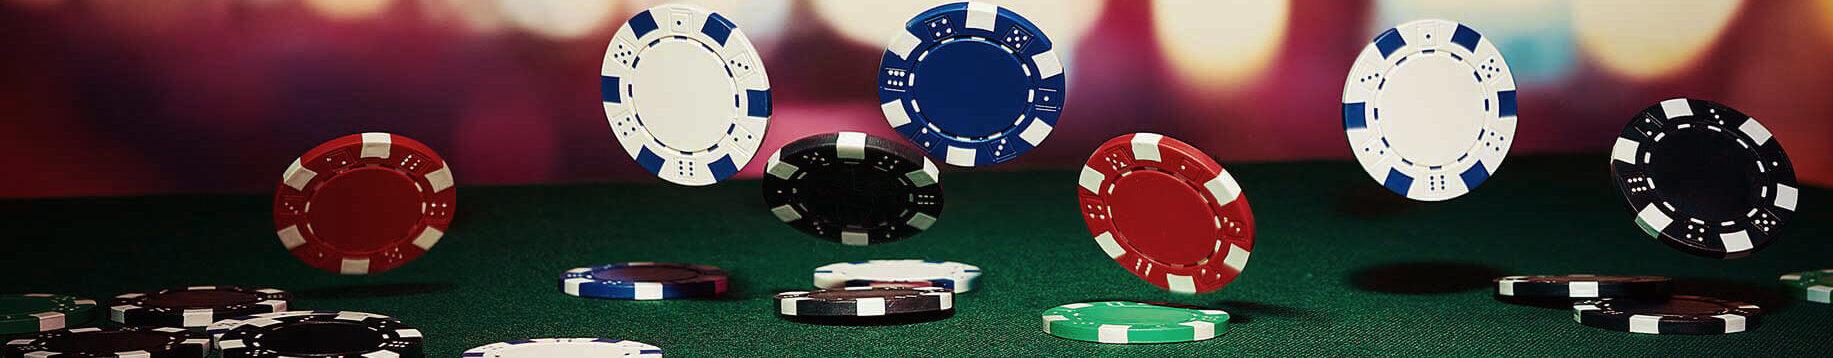 Black Jack Casino - 7413